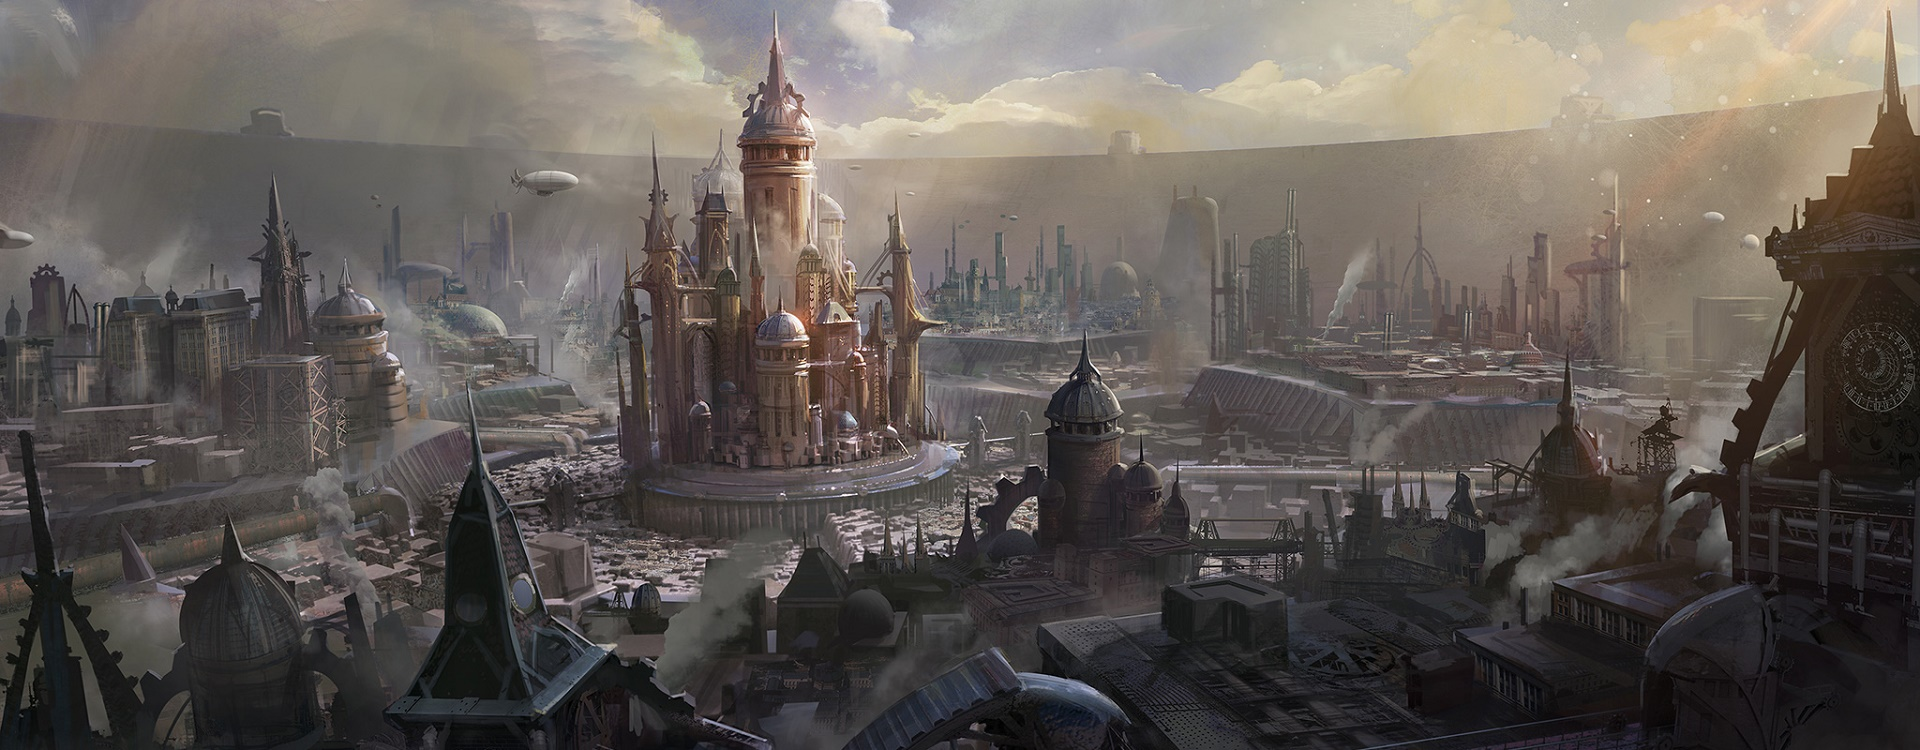 GYRE-MAELSTROM-CITY